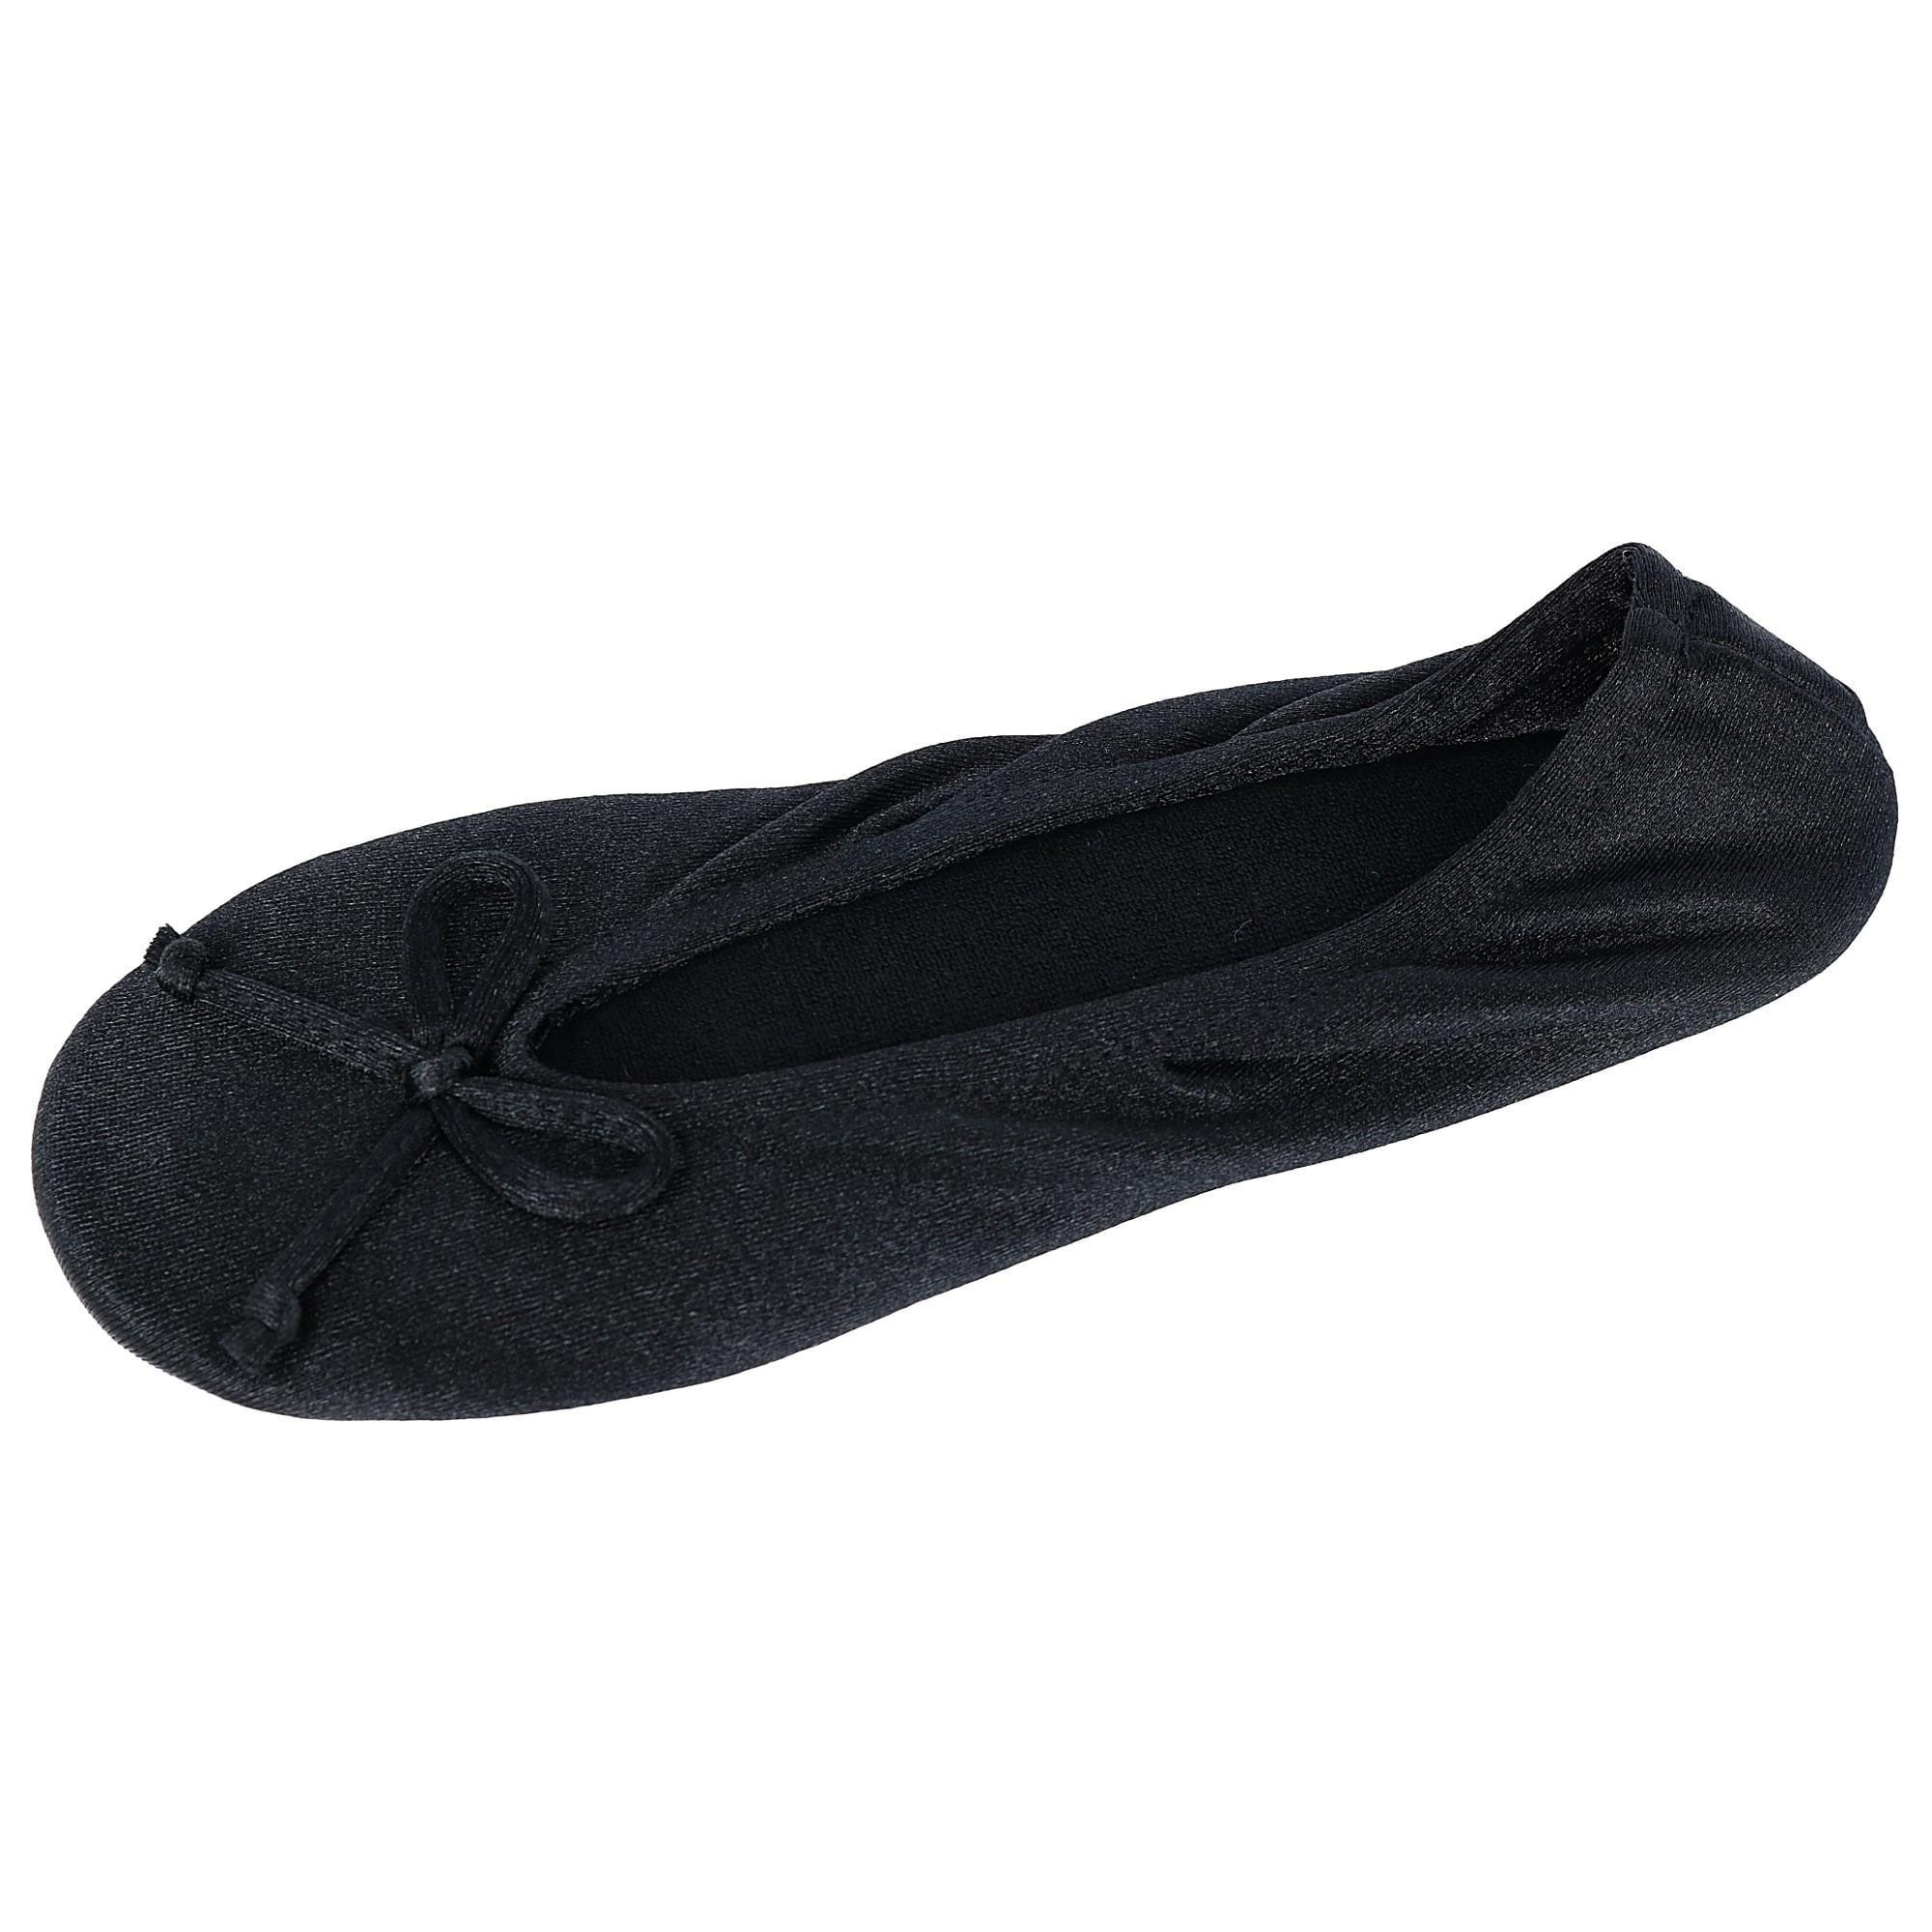 Satin Classic Ballerina Slippers